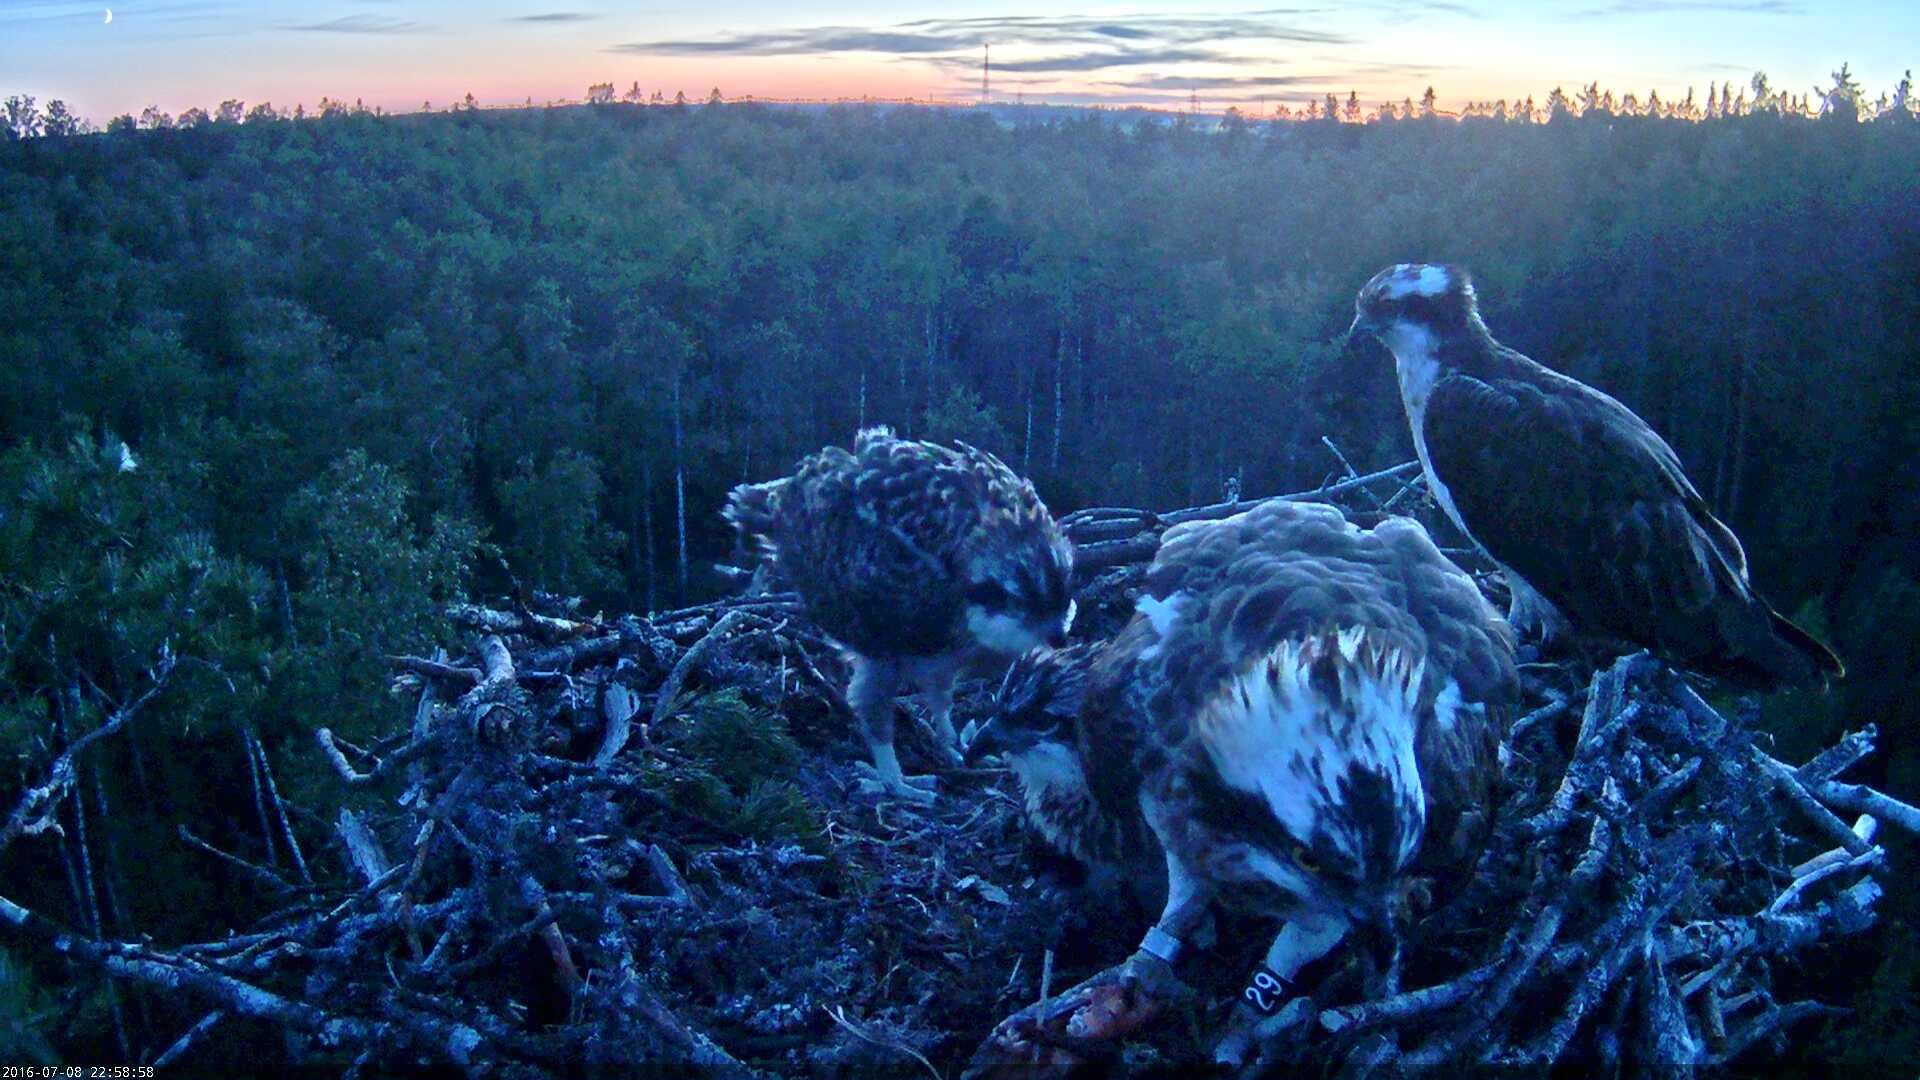 Estonian Osprey Nest Mai & Mati 2016 Kalakotkas-2016-07-08-22-58